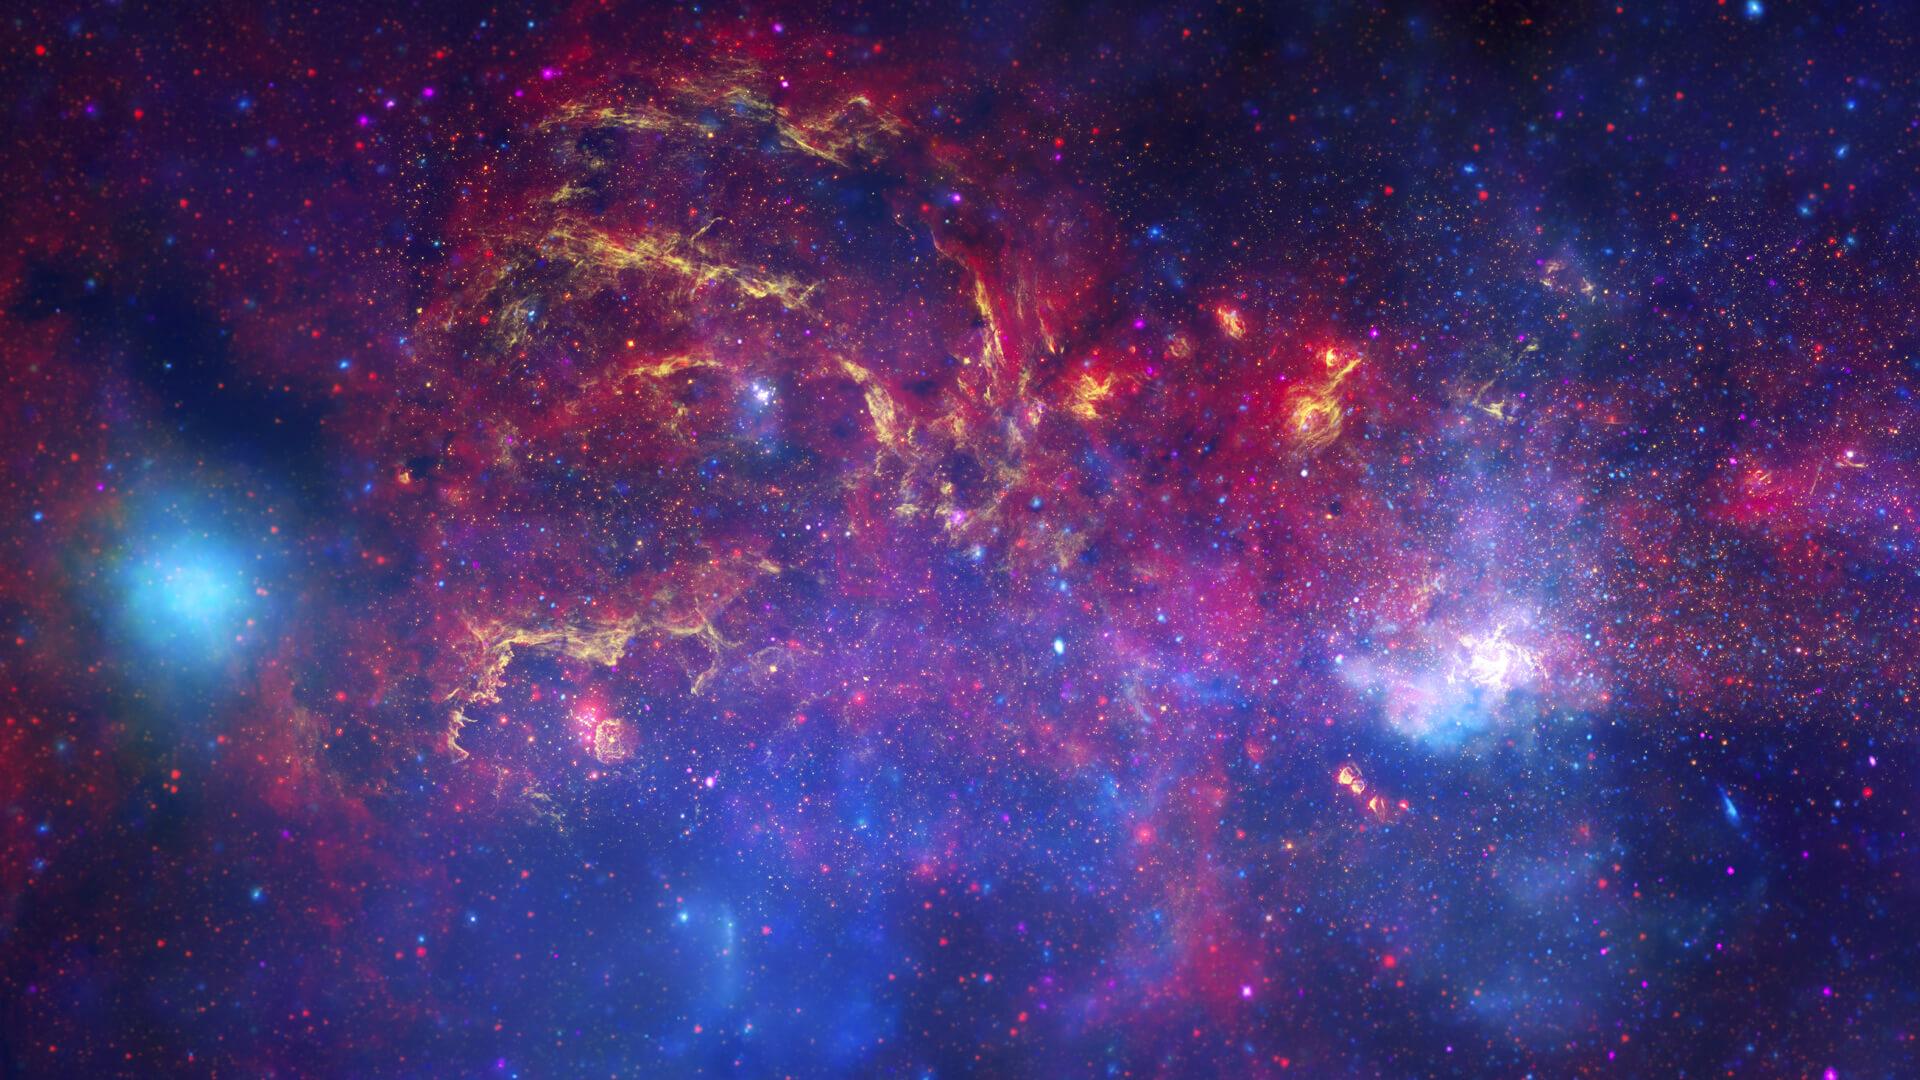 Image Credit: NASA/JPL-Caltech/STScI/CXC/SAO